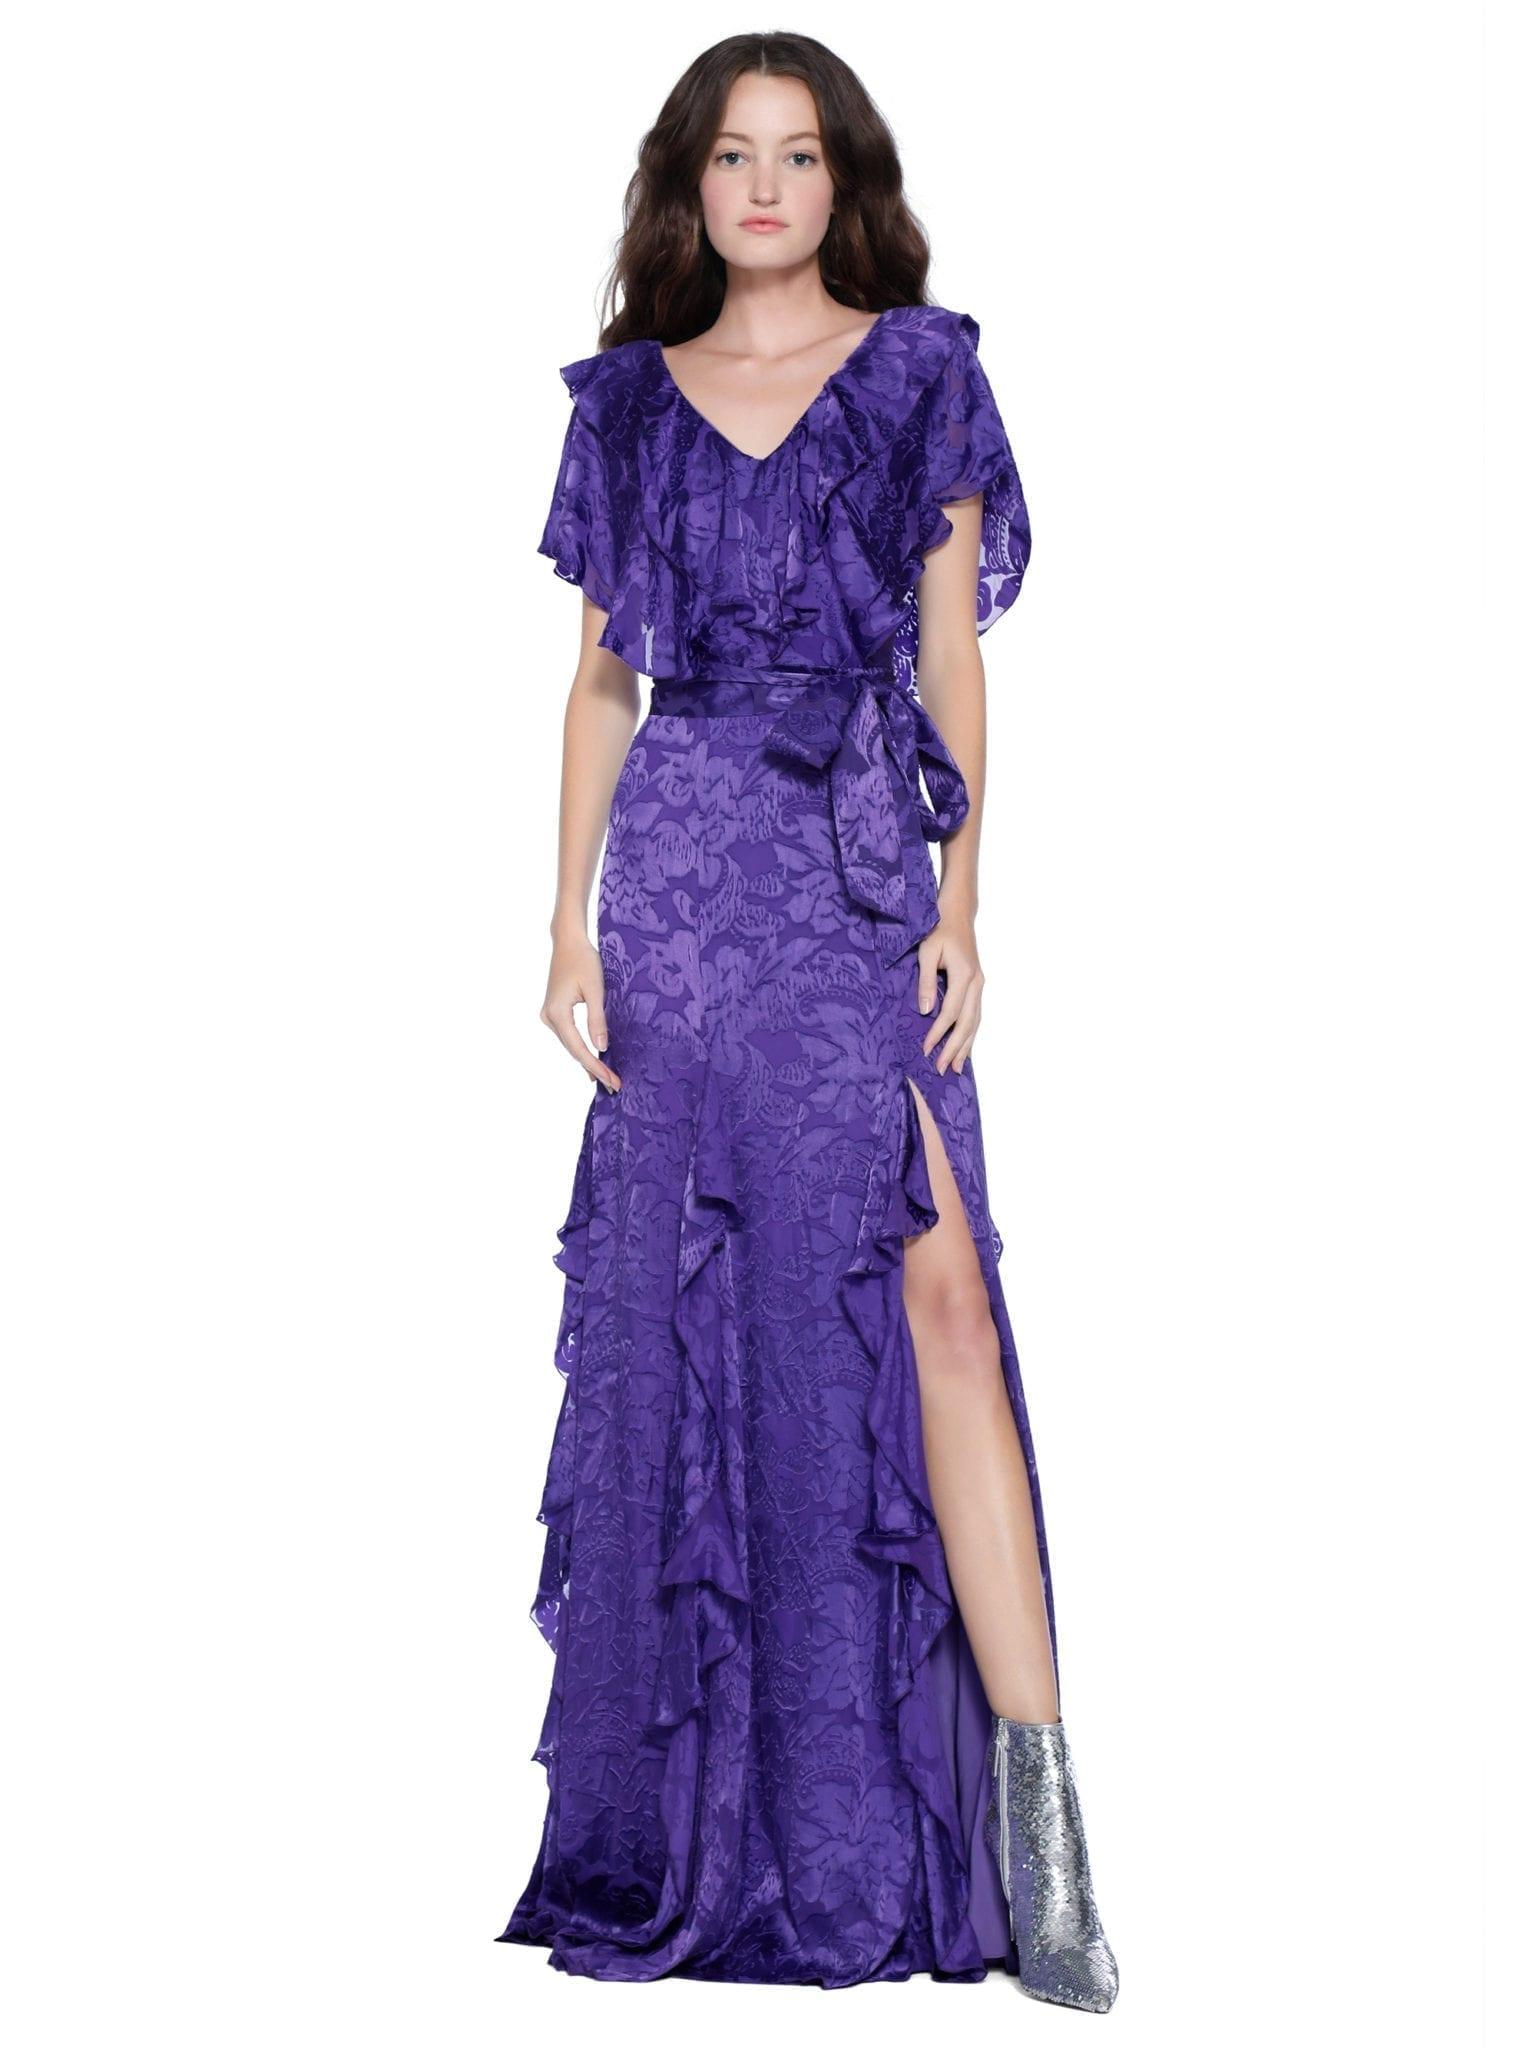 Alice + Olivia Tessa Ruffle Godet Maxi Purple Dress